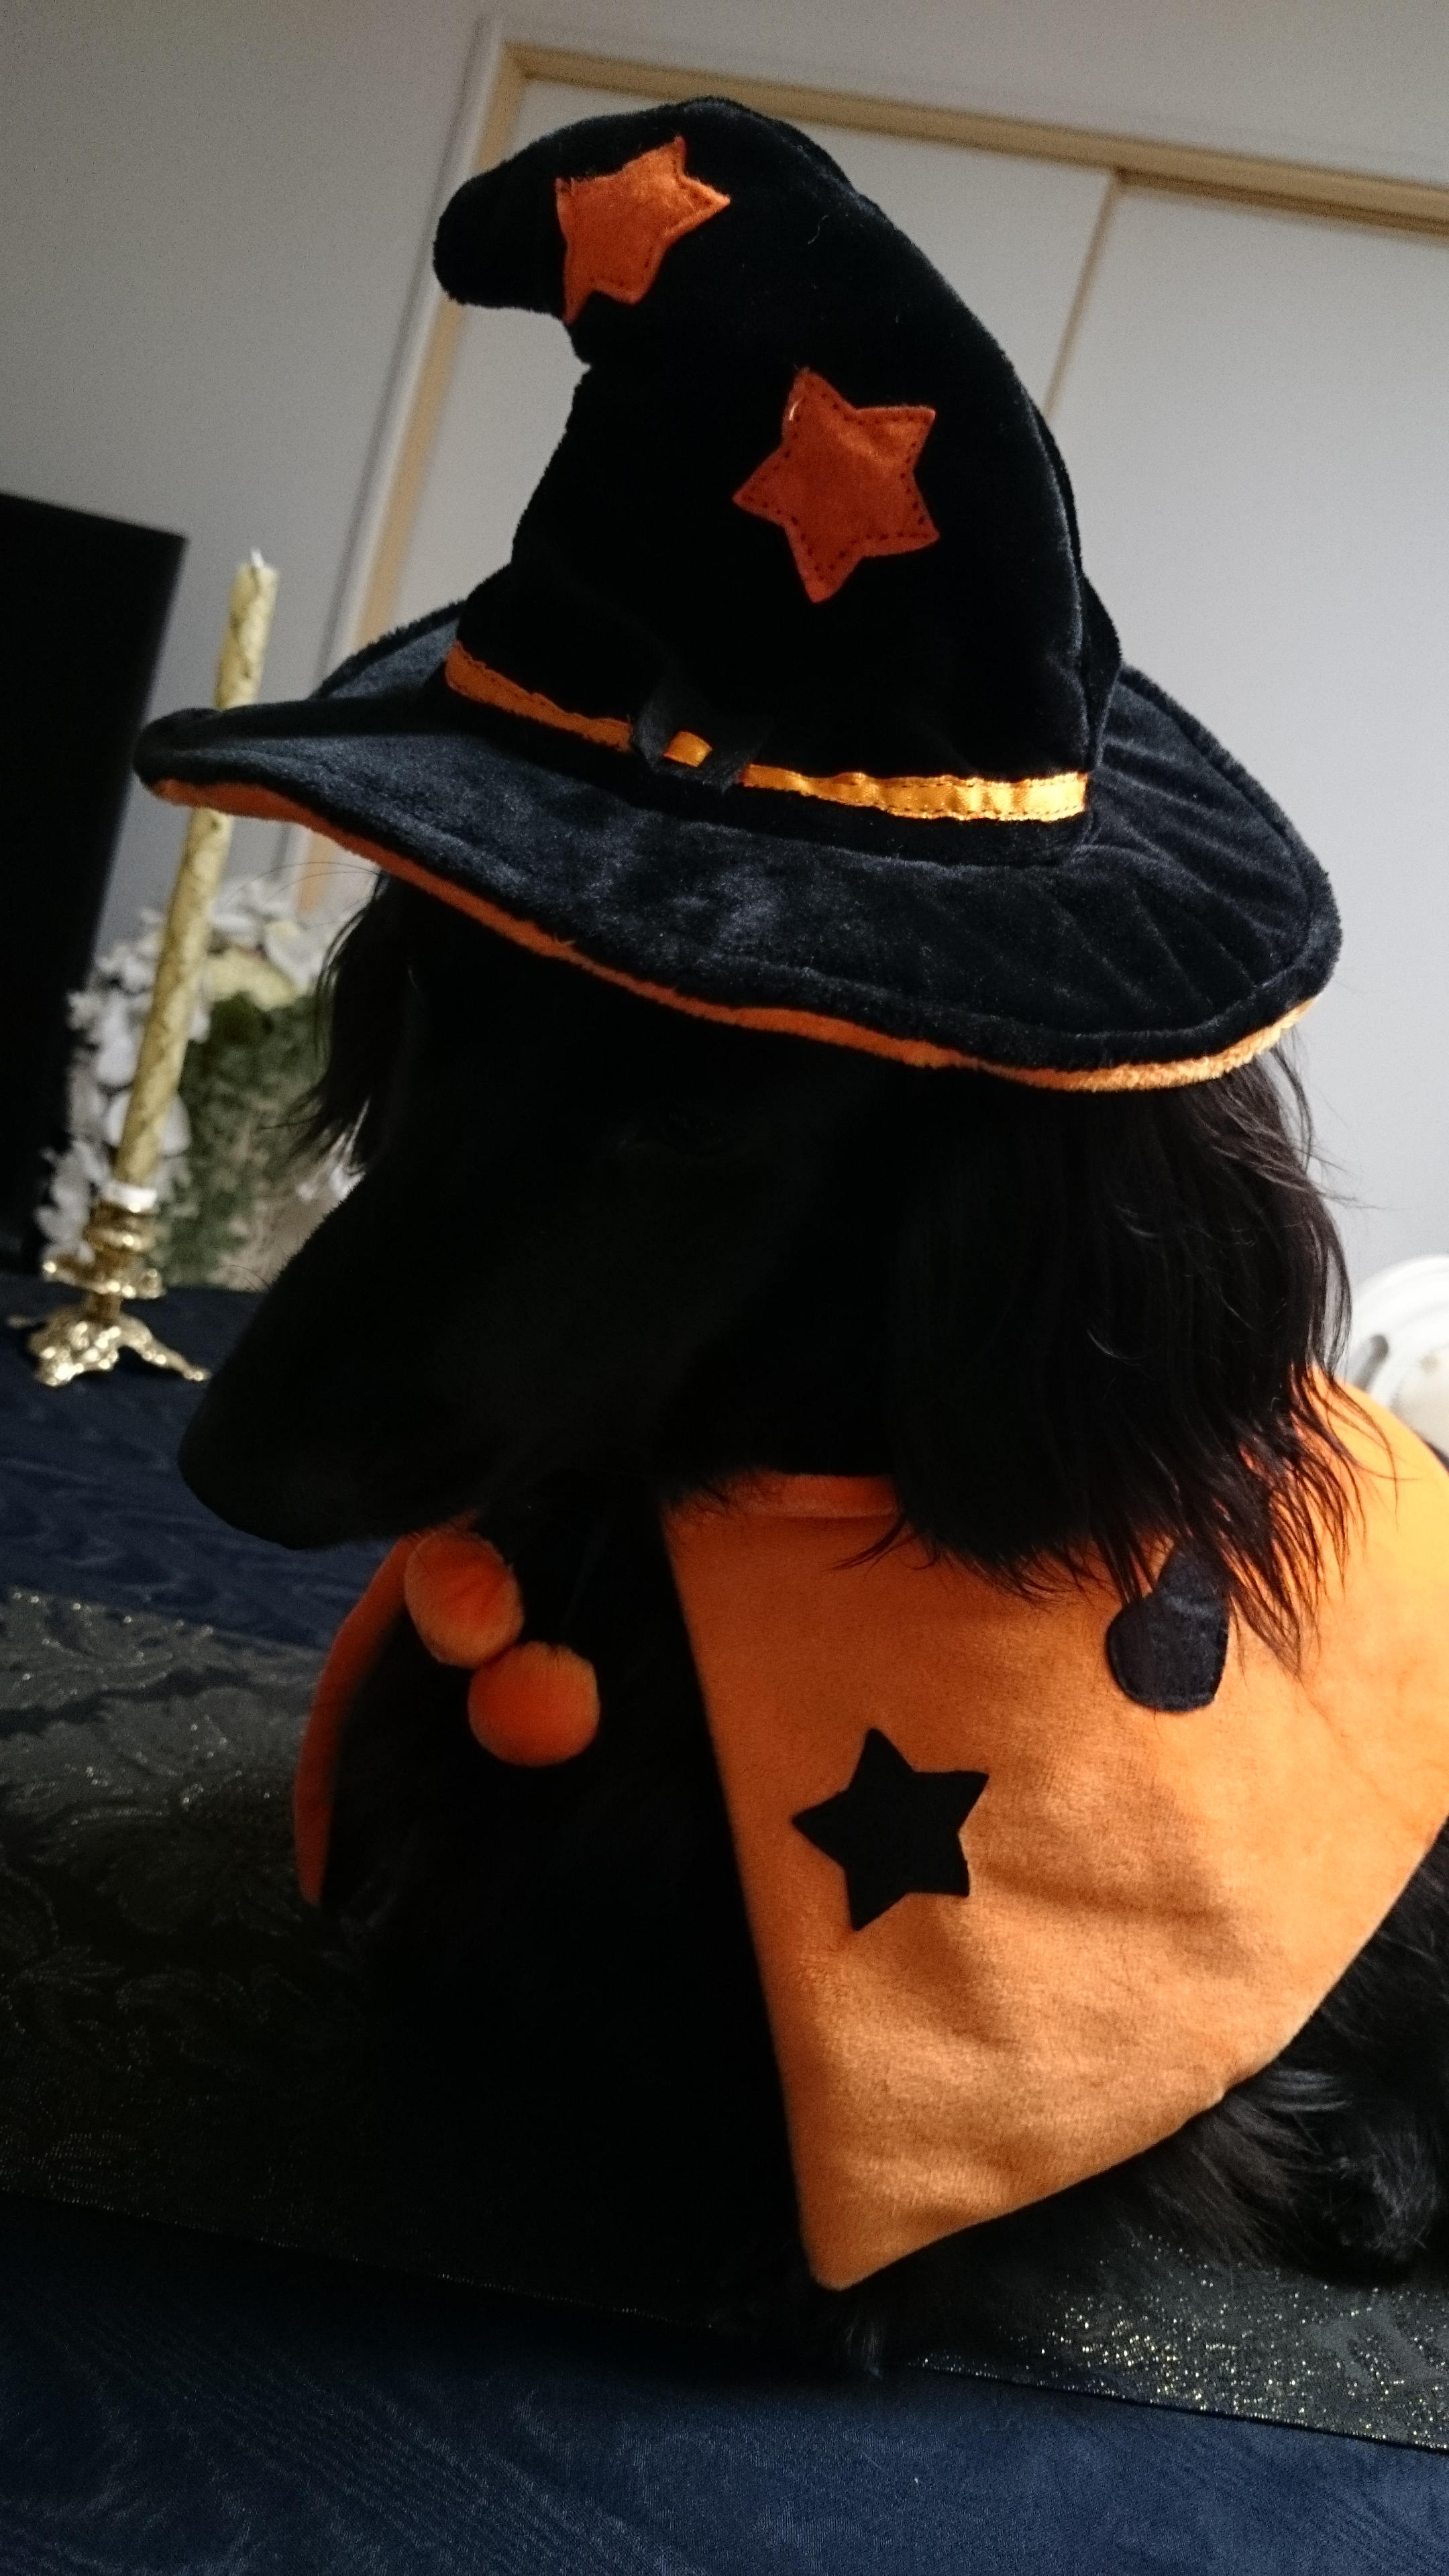 151102_Halloween_03.jpg